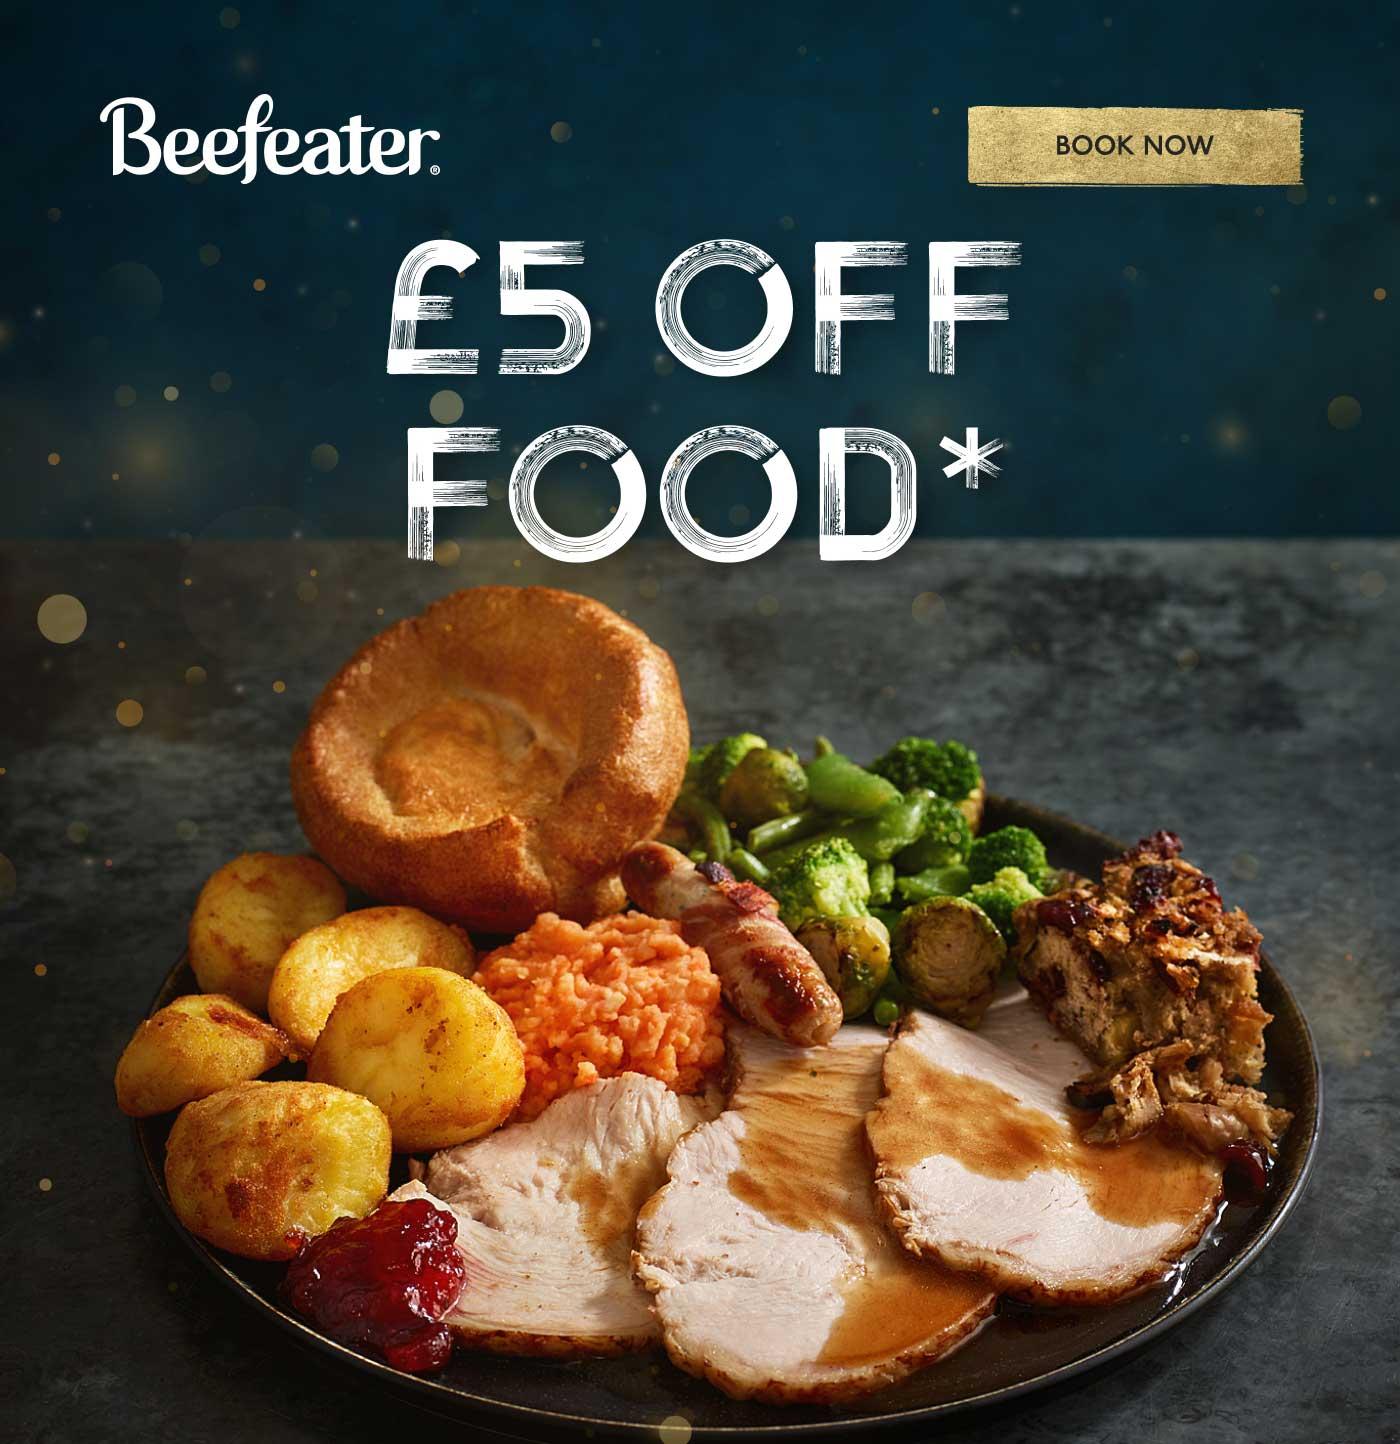 £5 OFF FOOD*